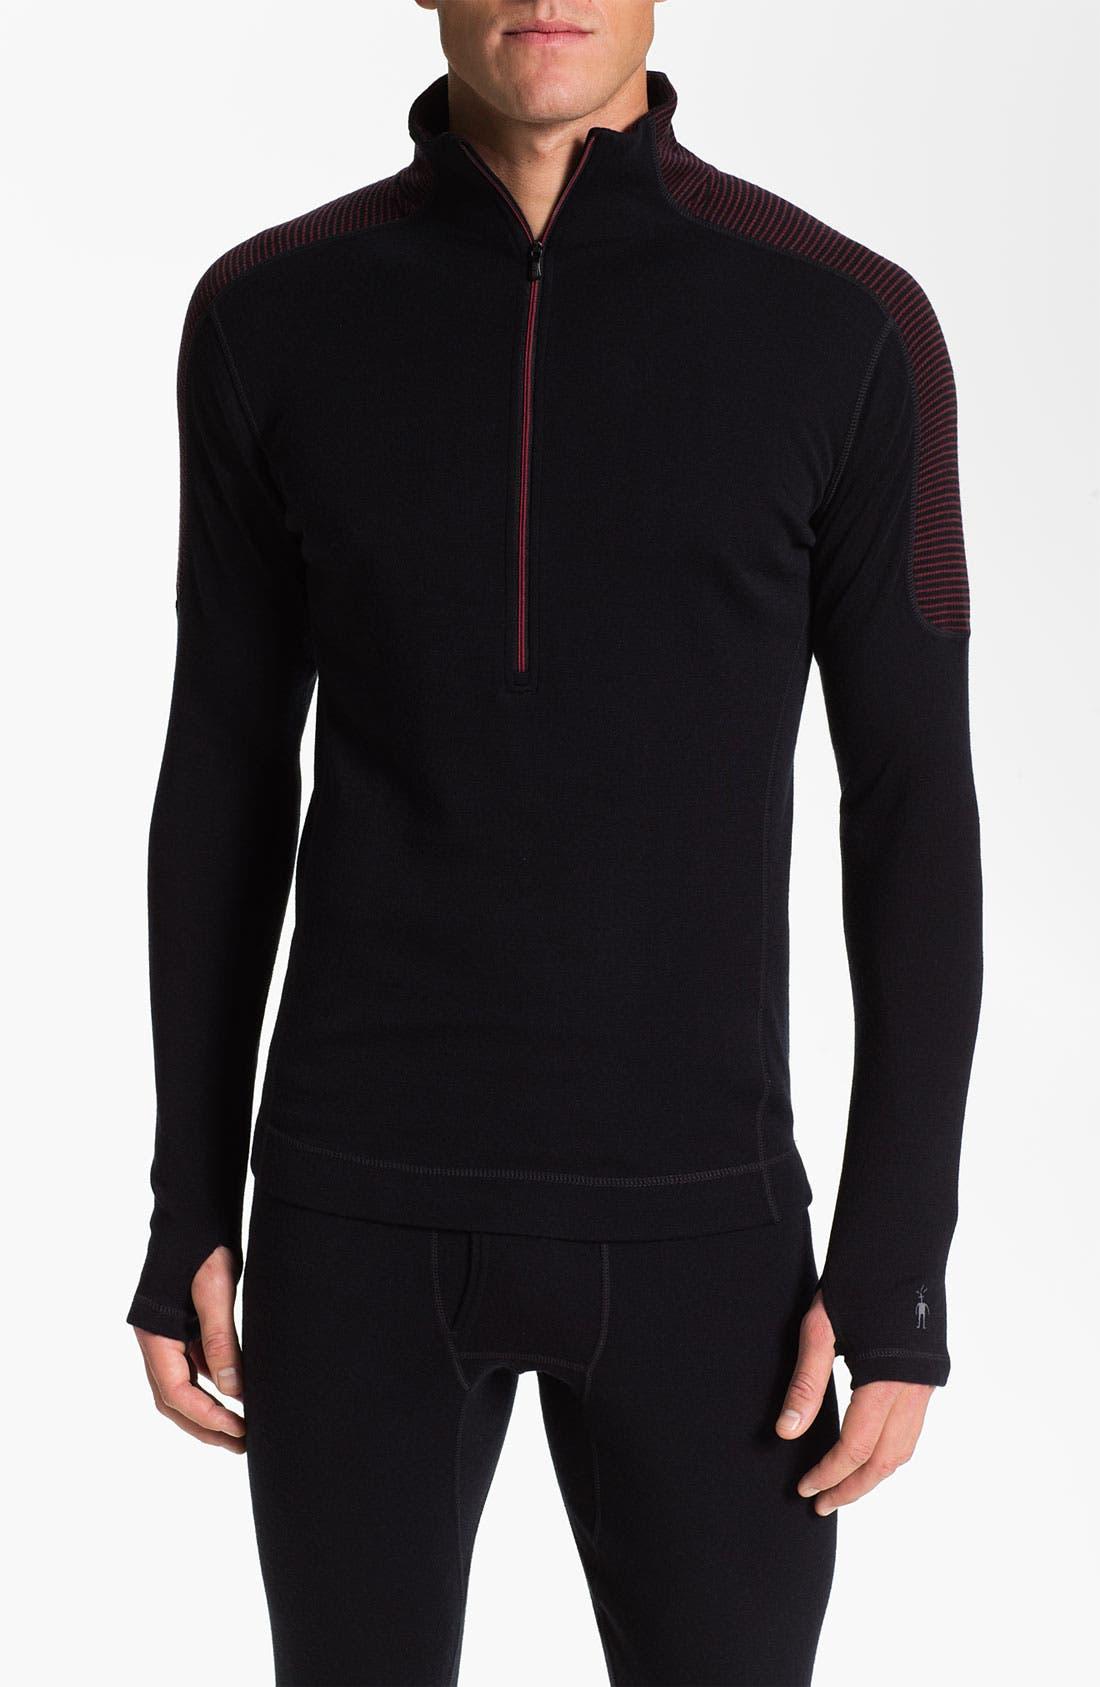 Main Image - Smartwool 'Midweight 250' Half Zip Pullover